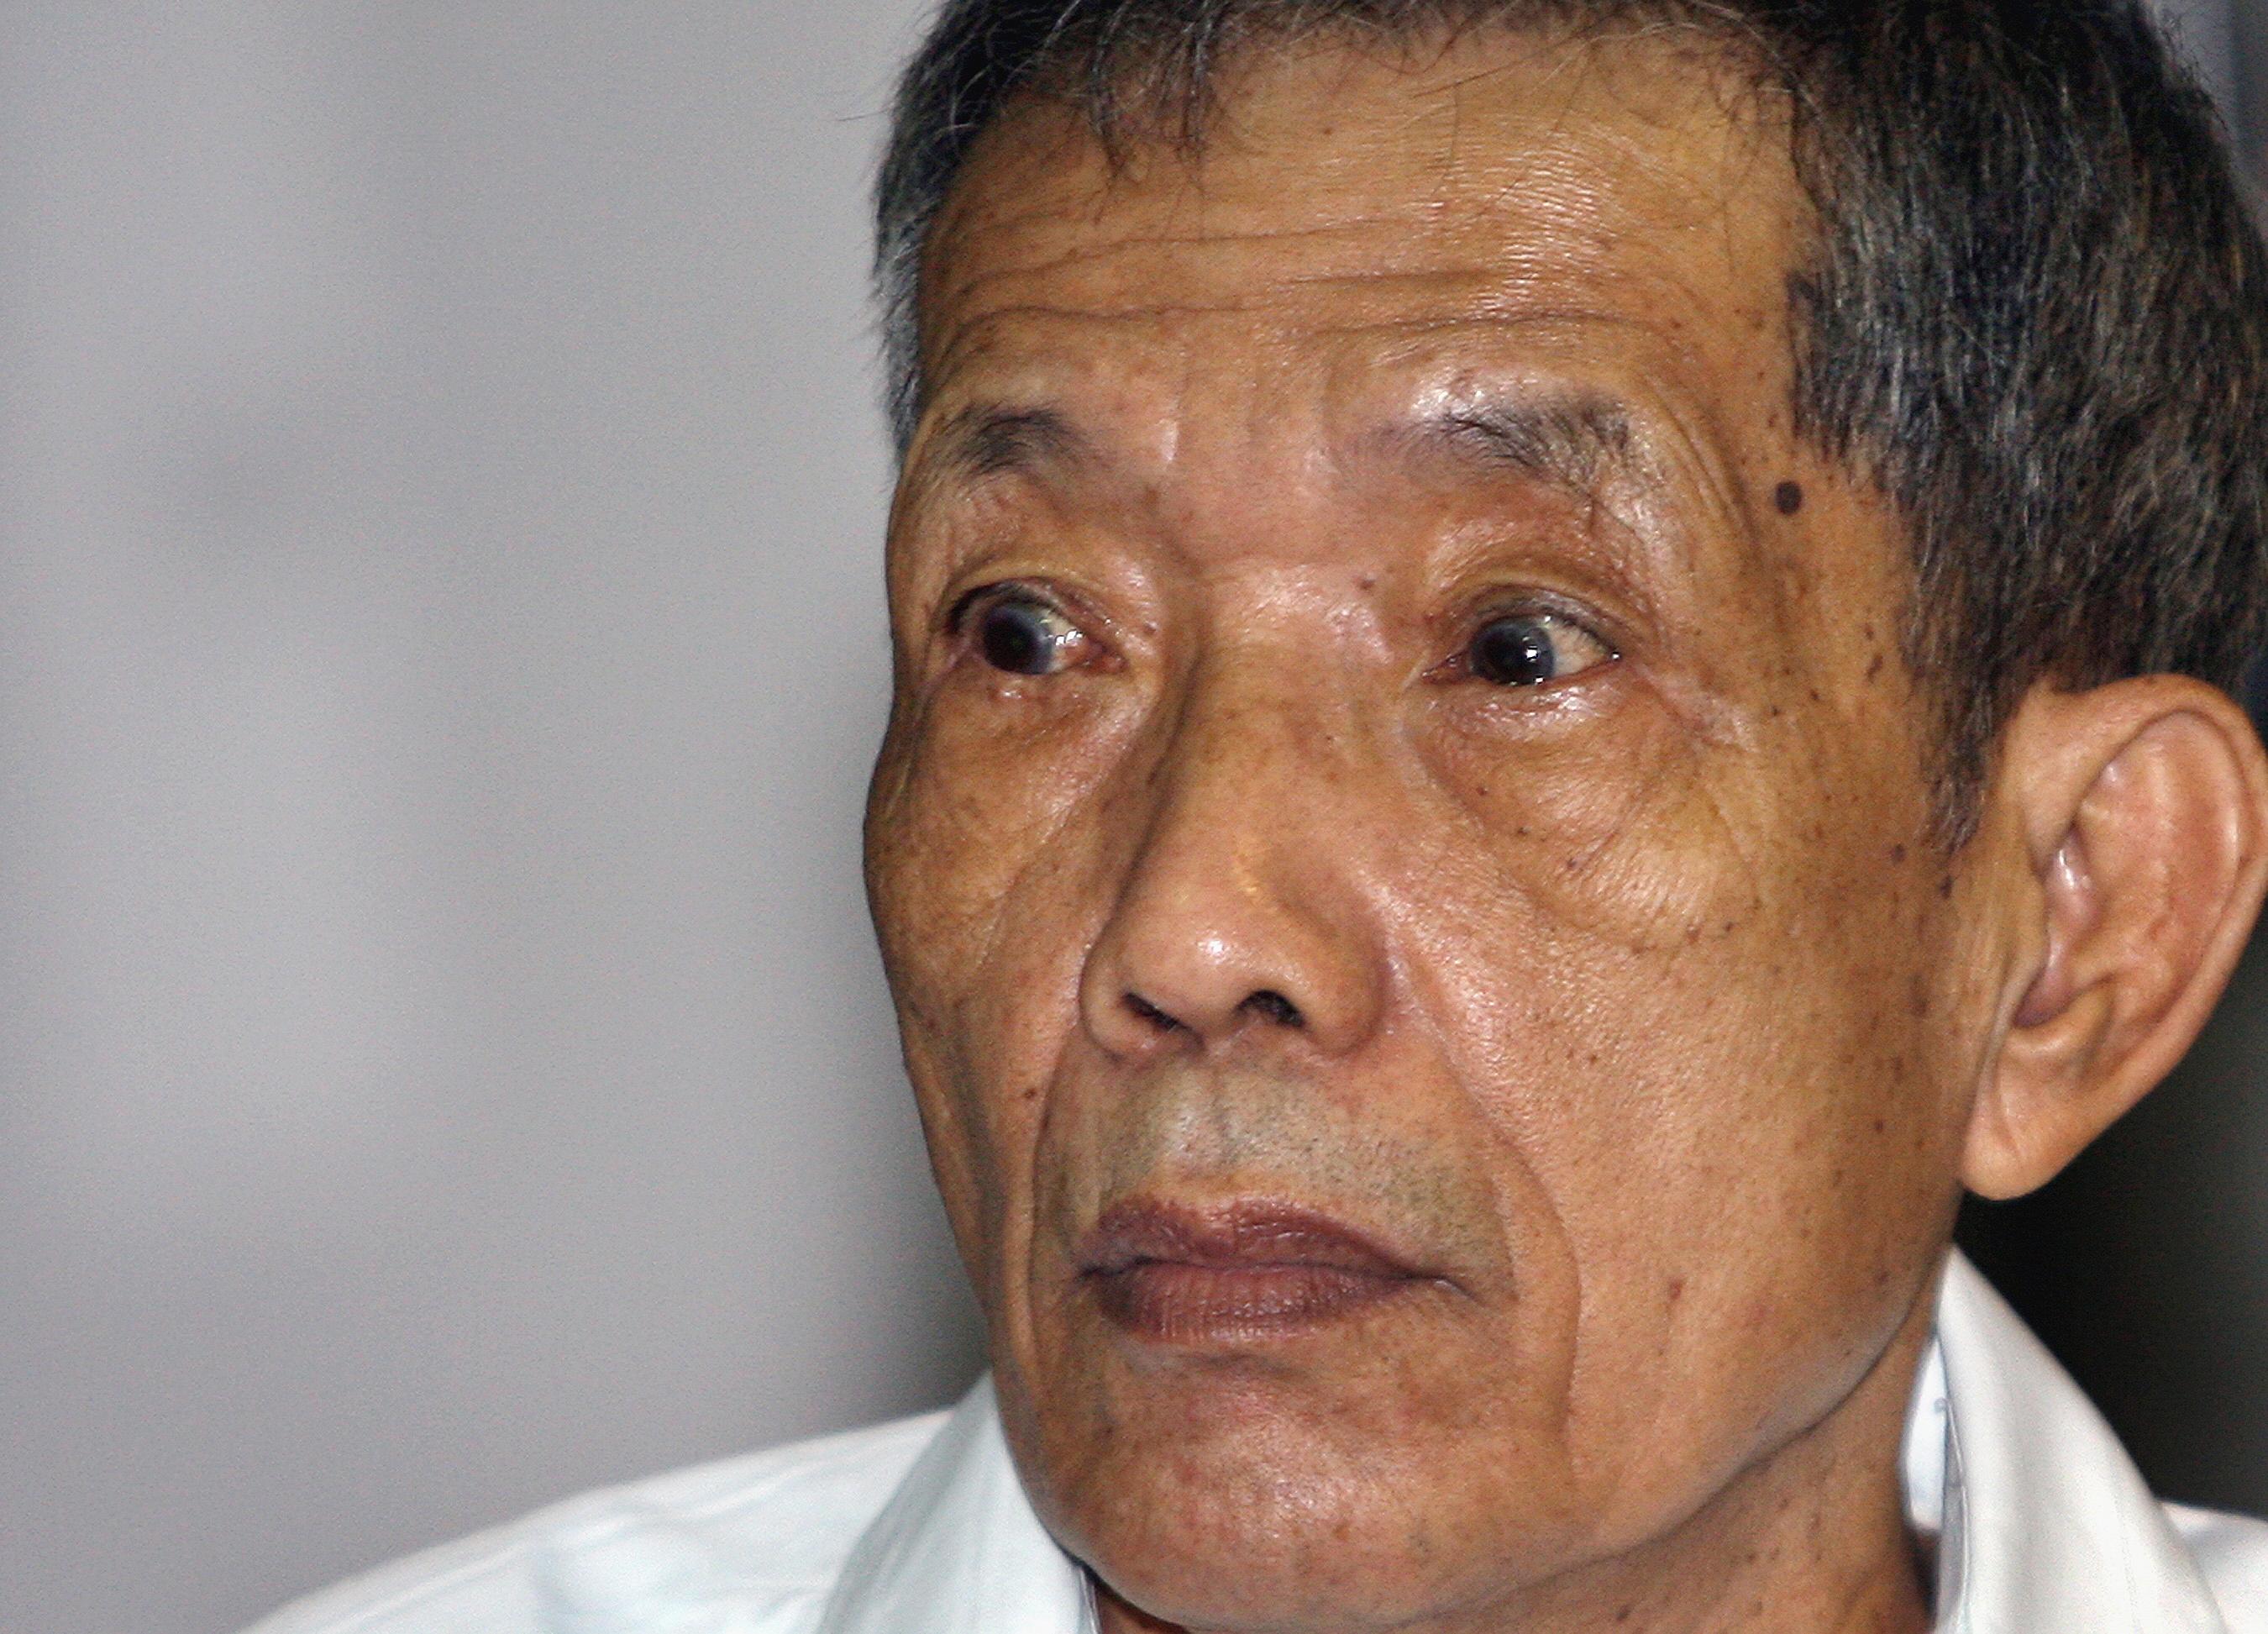 Meghalt Duch, a kambodzsai kínzómester